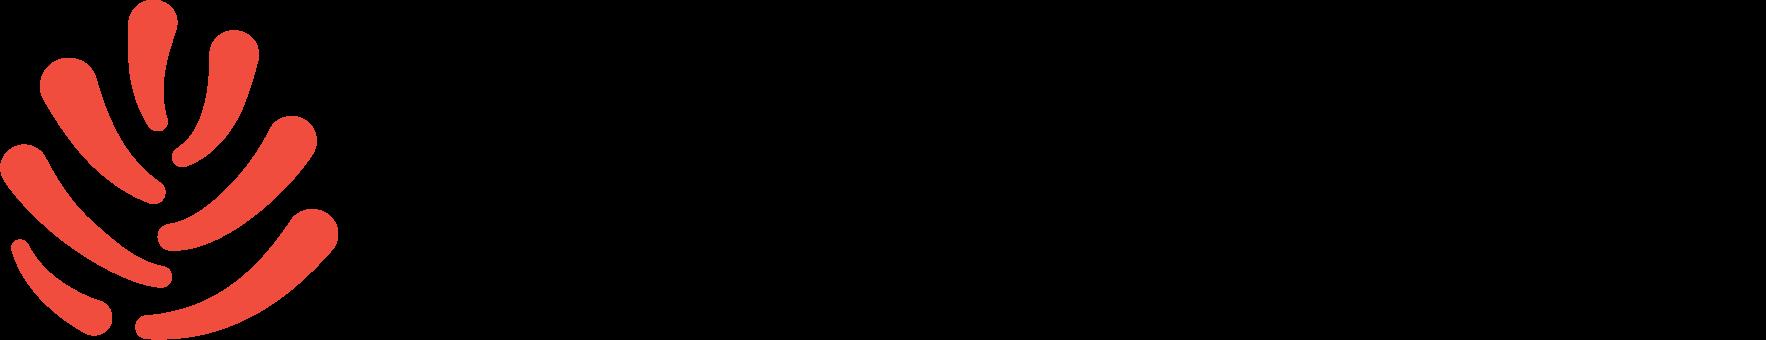 Warkworth Oaks logo